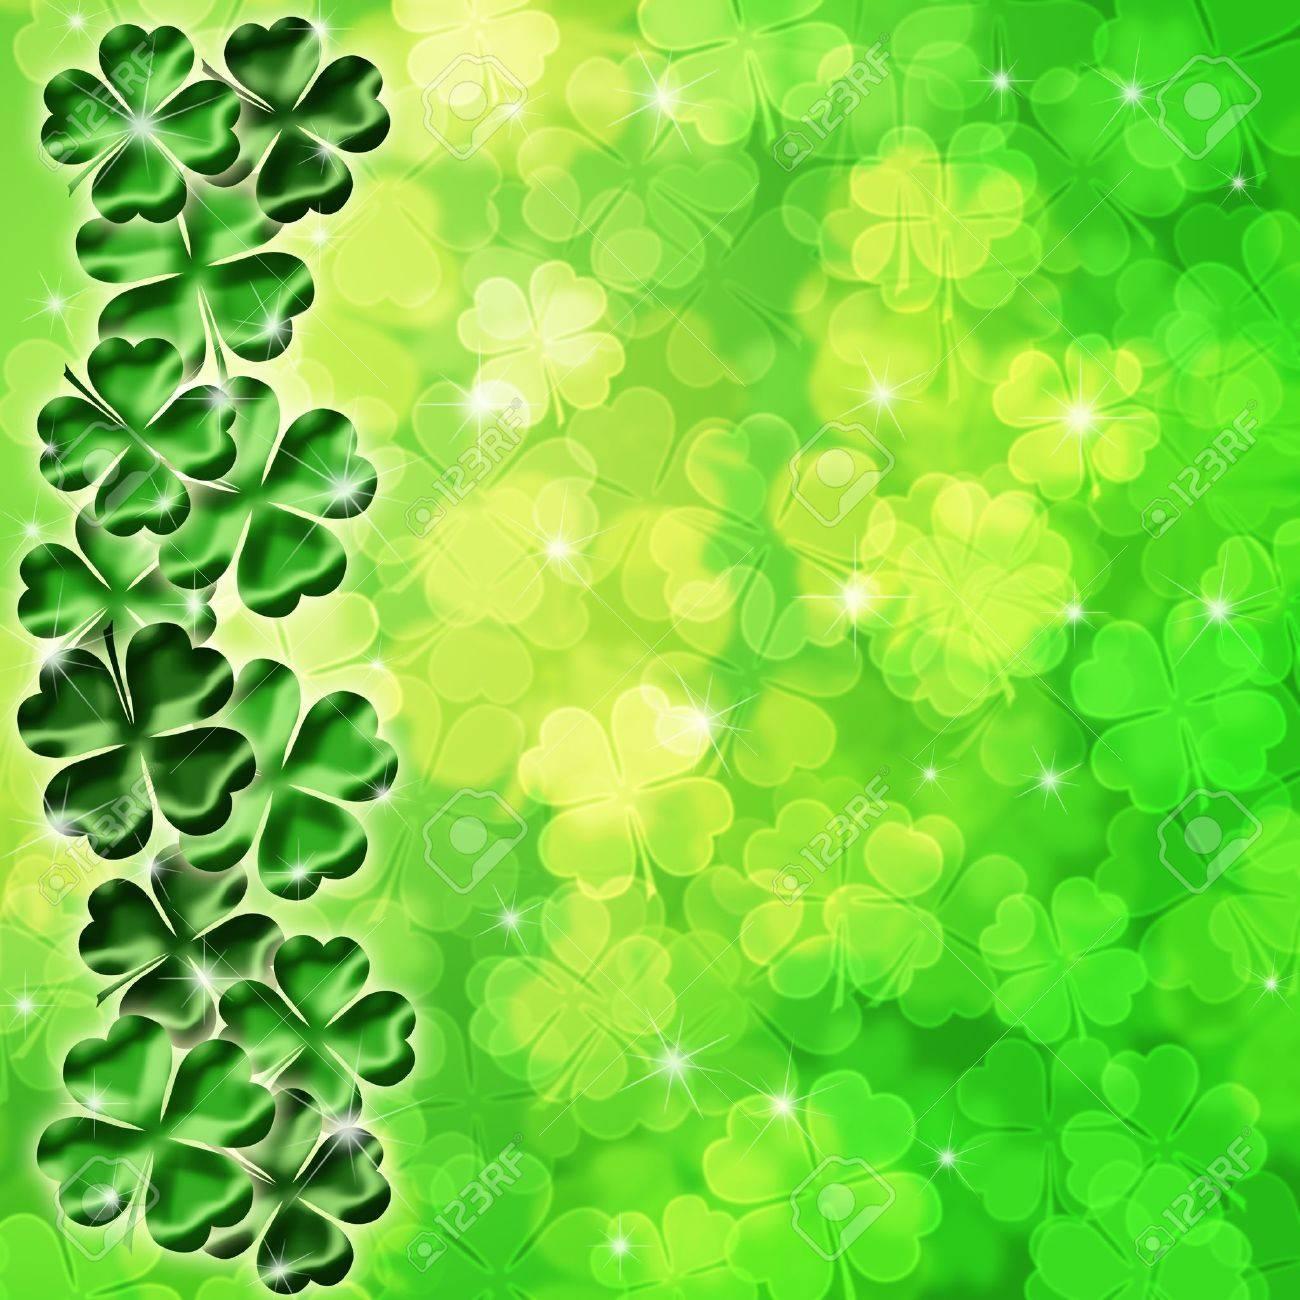 Lucky Irish Four Leaf Clover Shamrock Sparkles on Blurred Background Illustration Stock Illustration - 11266671